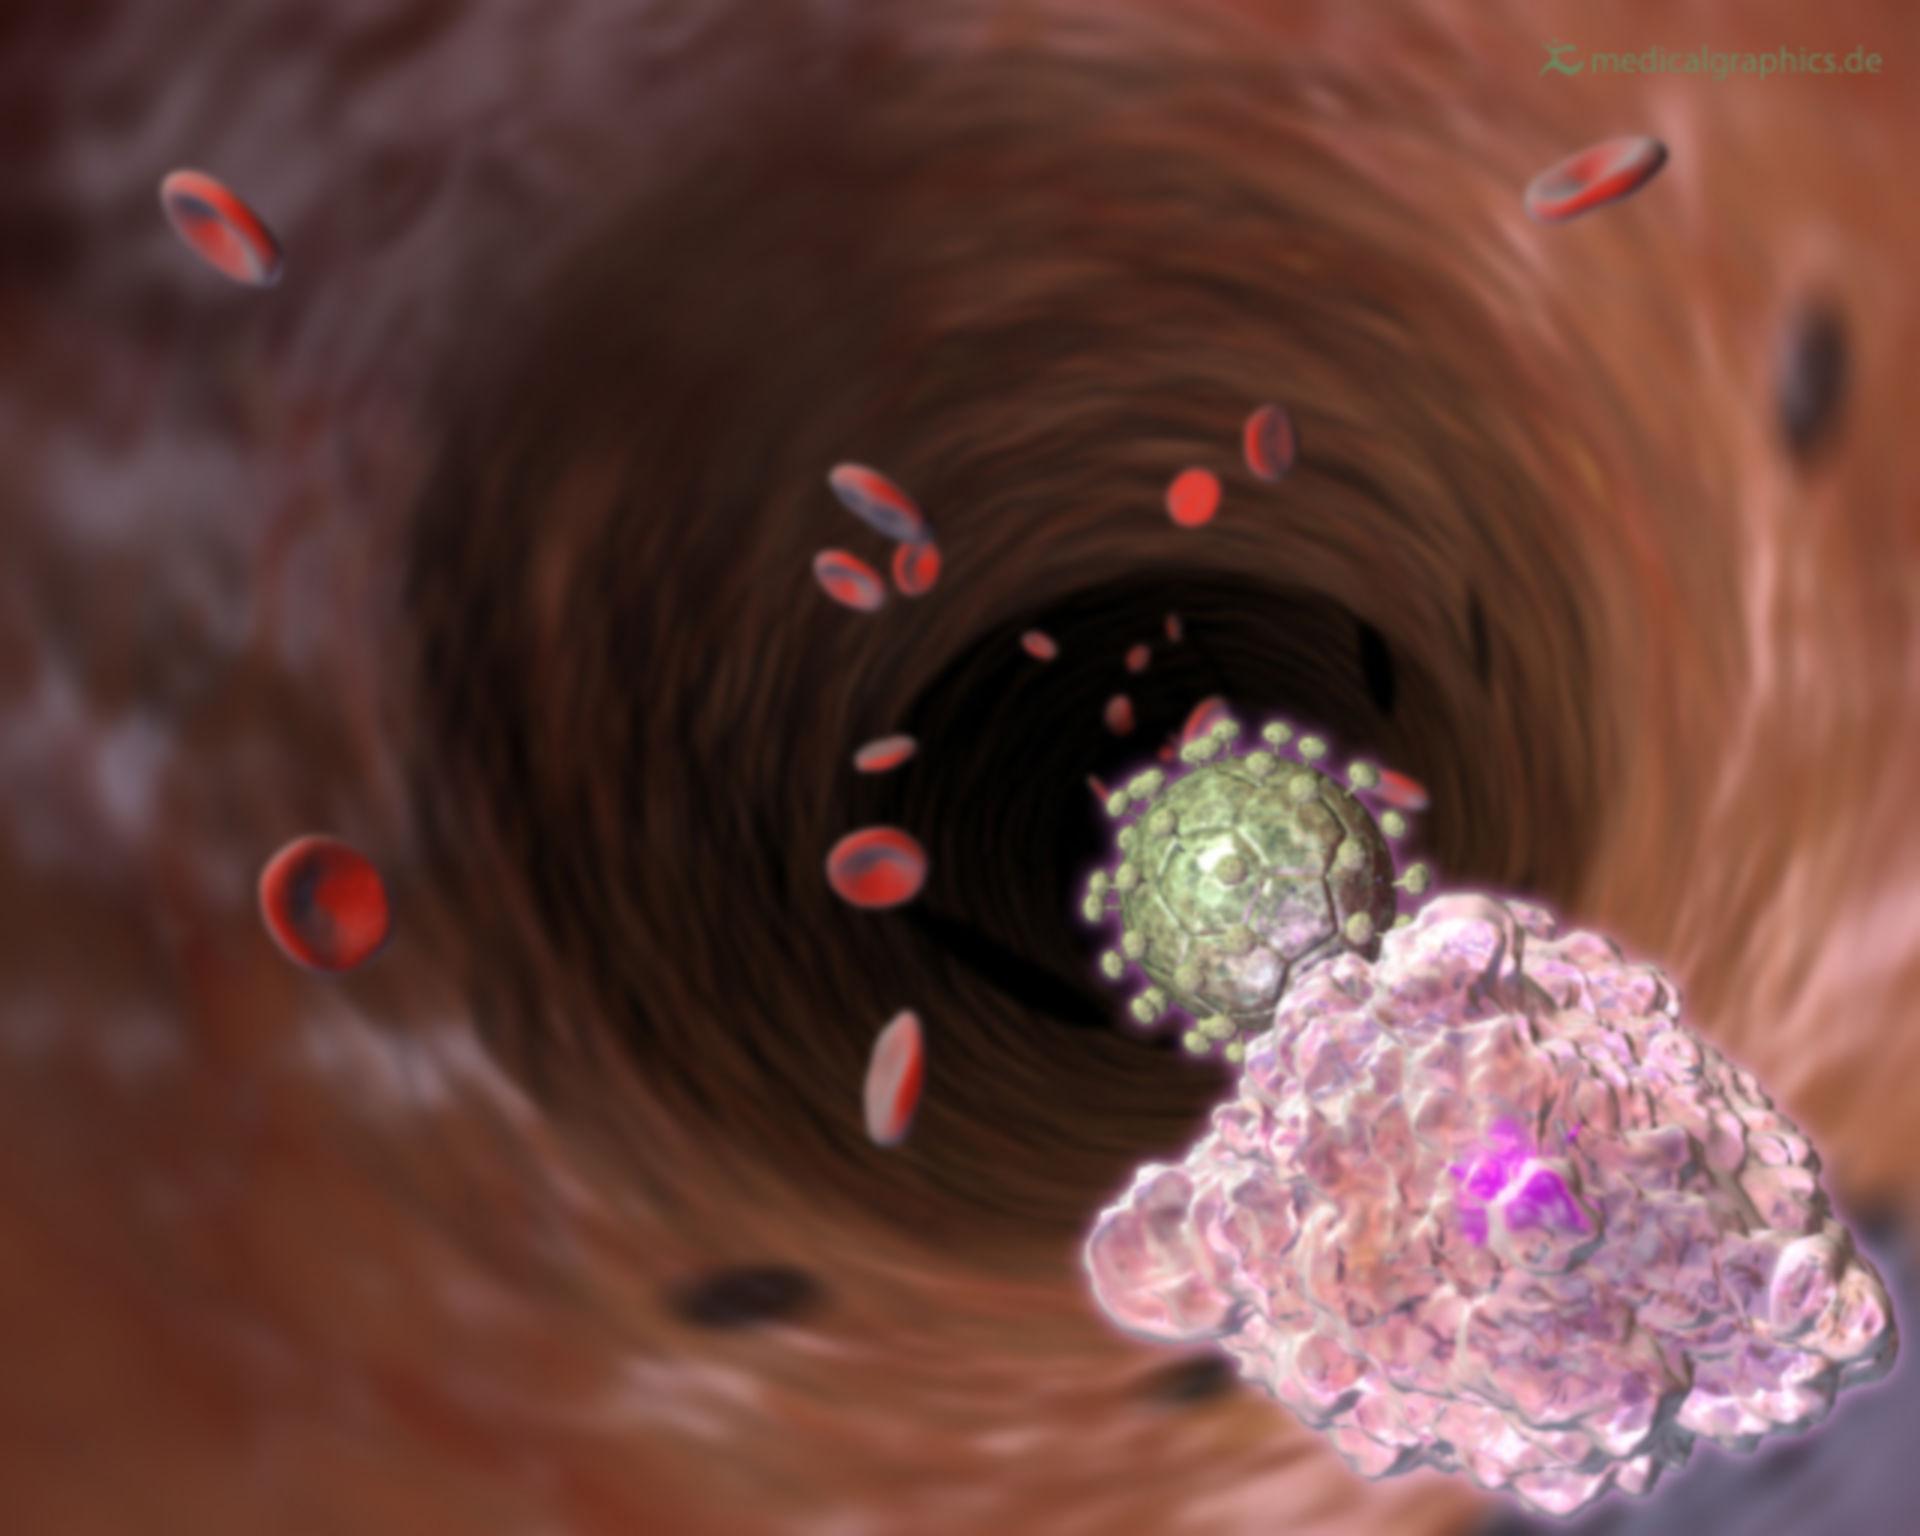 HI virus in blood stream (illustration)